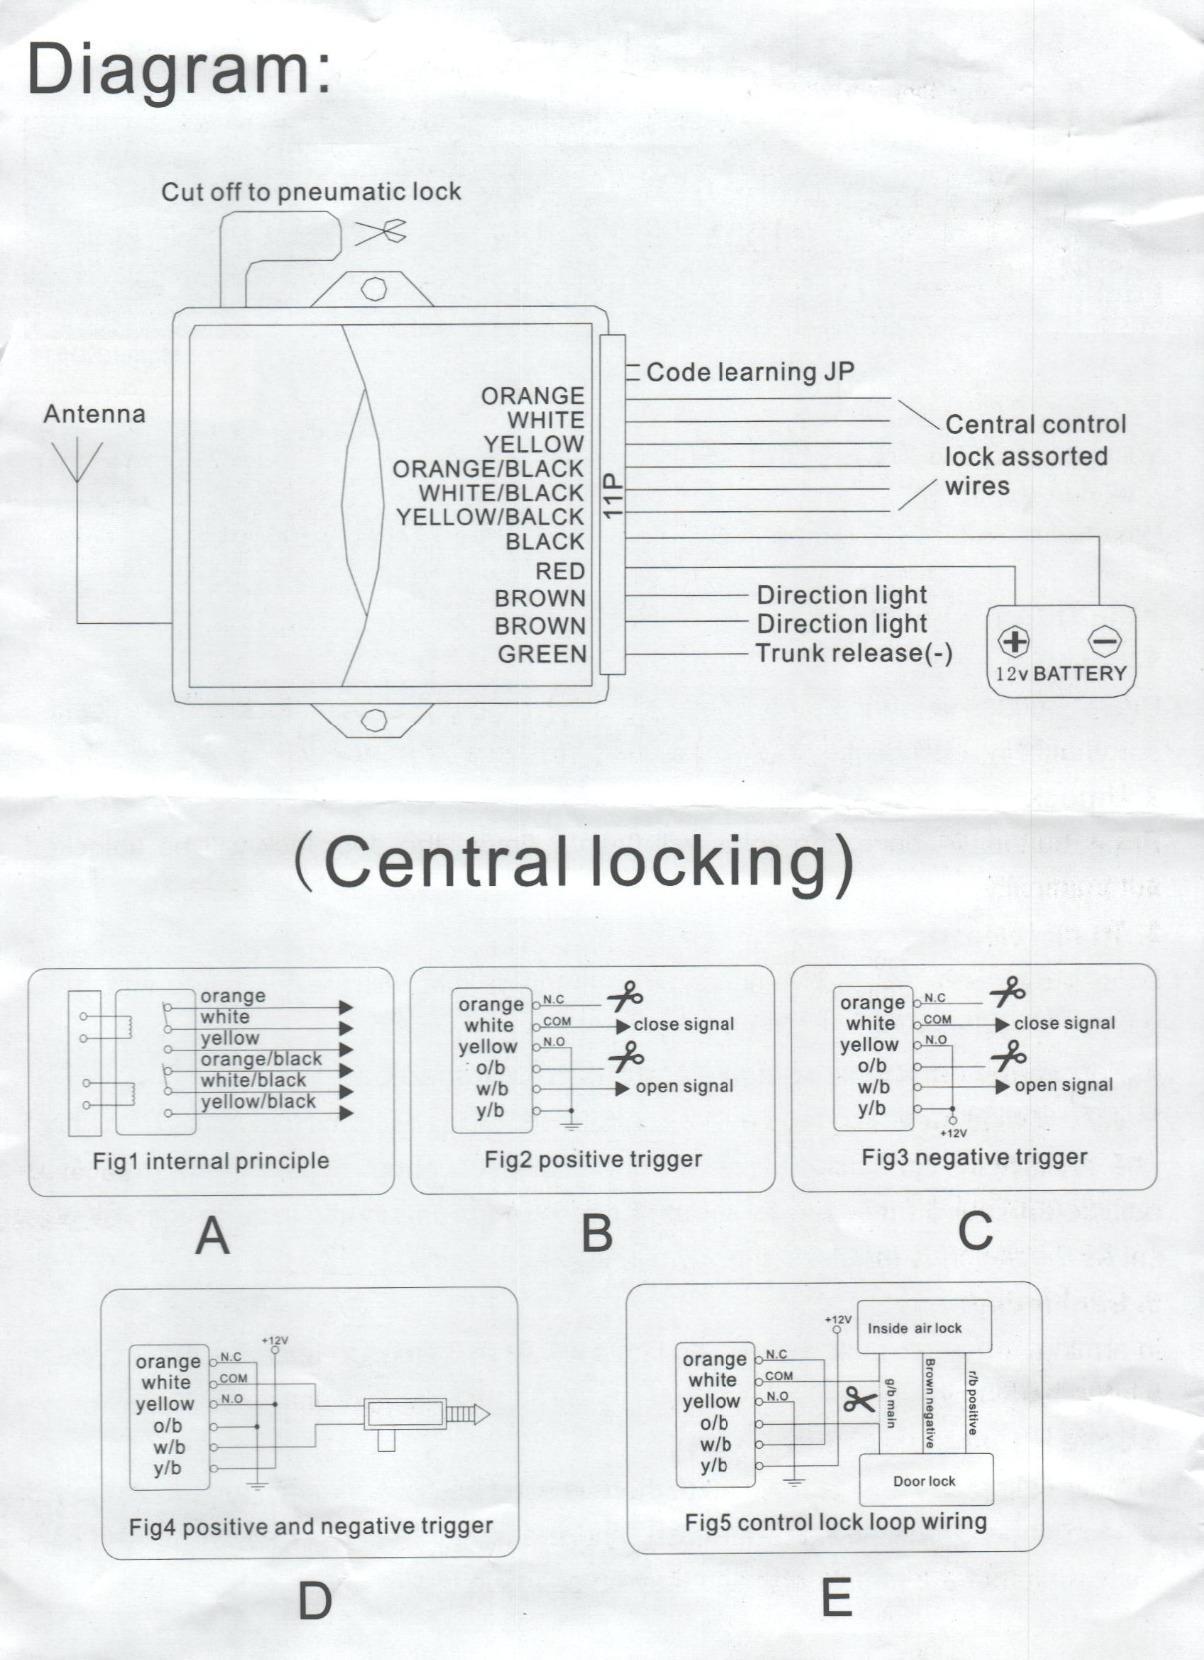 camry central locking wiring diagram | database wiring diagram models -  database.hoteldelmarlidodicamaiore.it  wiring diagram library